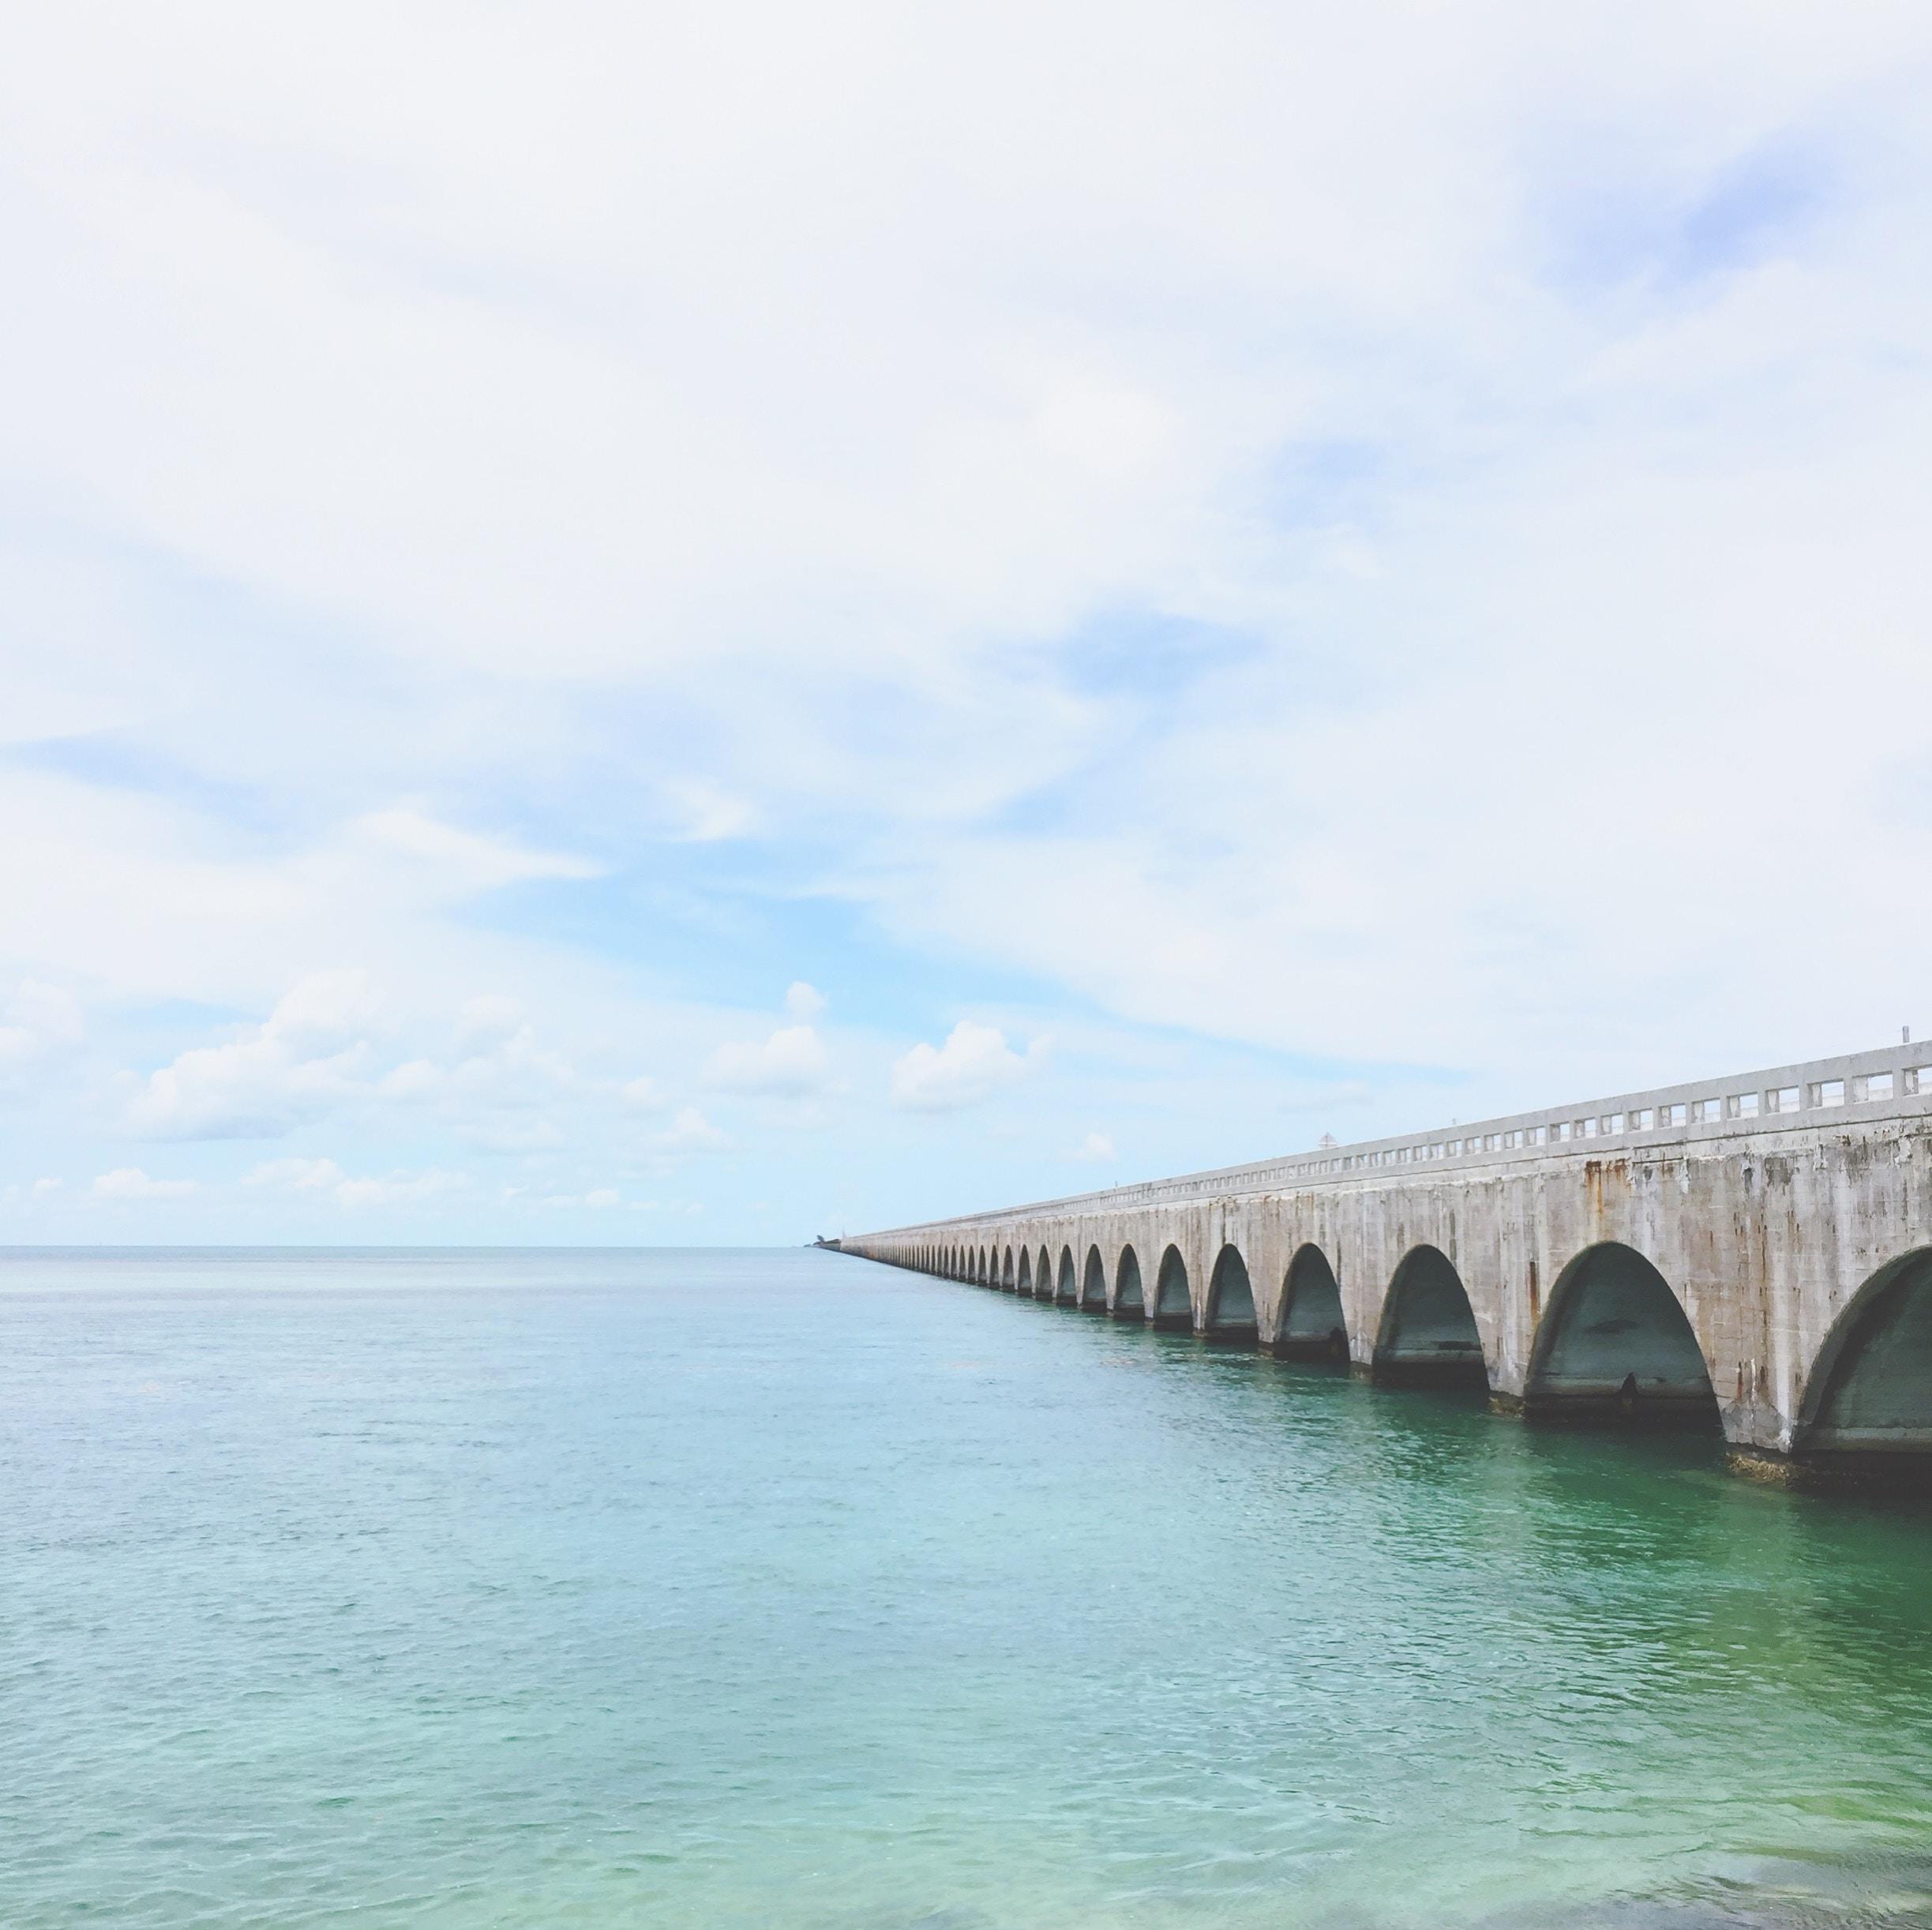 panoramic photography of bridge